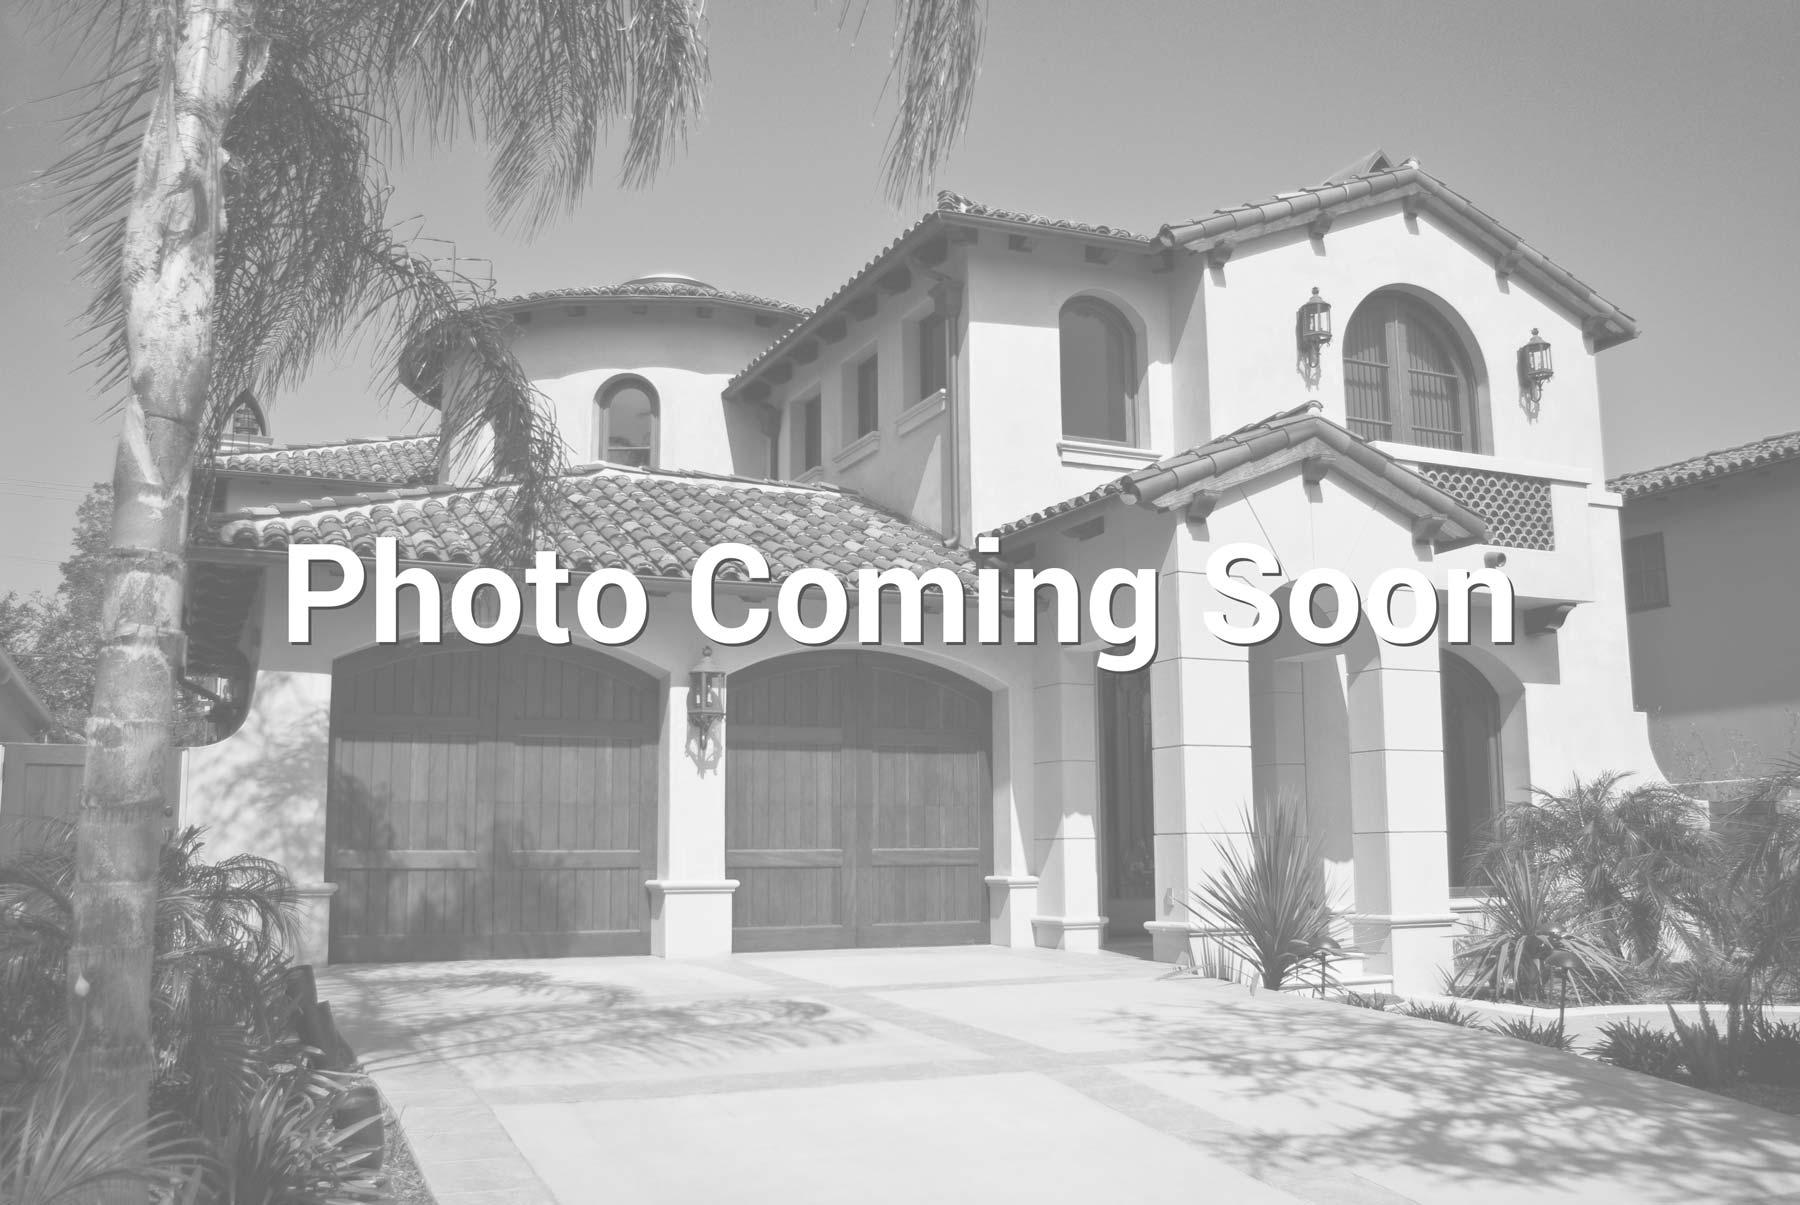 $269,900 - 3Br/2Ba -  for Sale in Homewood Heights, Sarasota